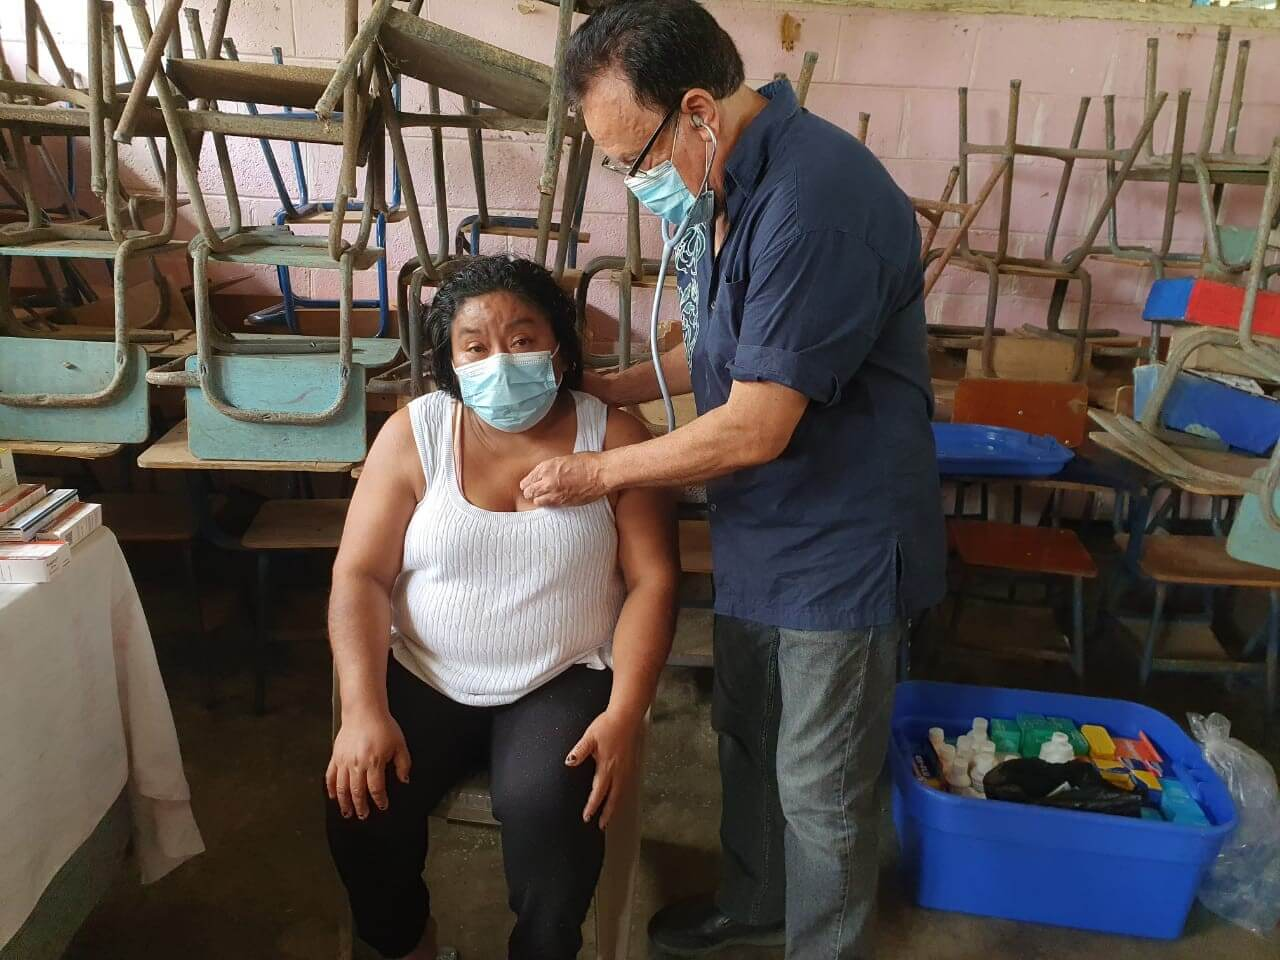 World's Leading Banana Company Organizes Donations to Central America